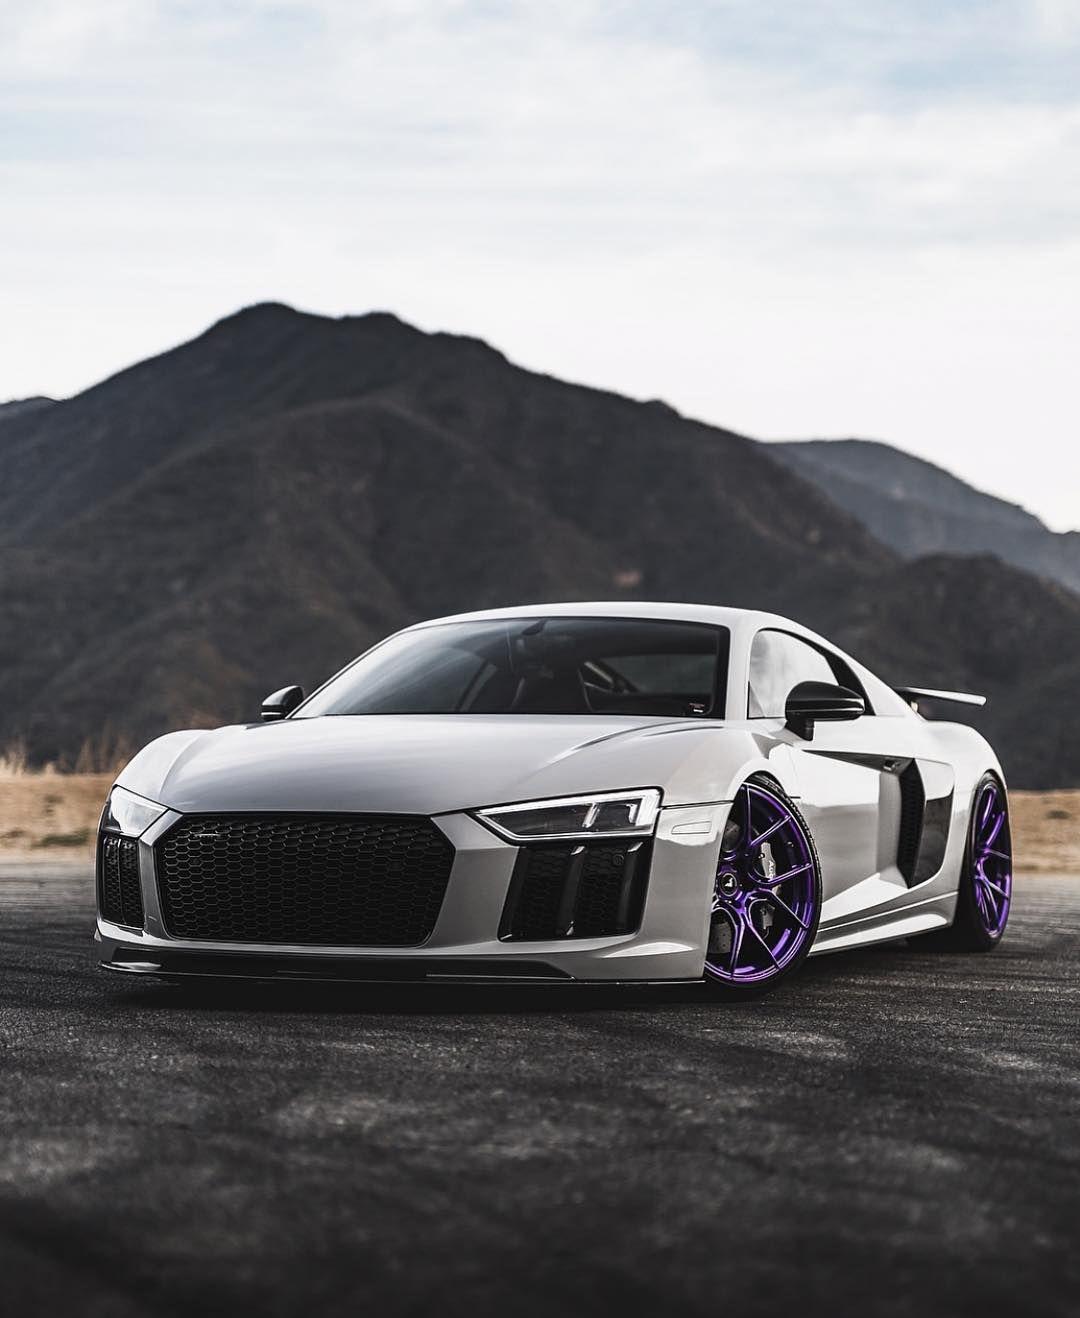 R8 Supercar Super Cars Audi Audi Cars